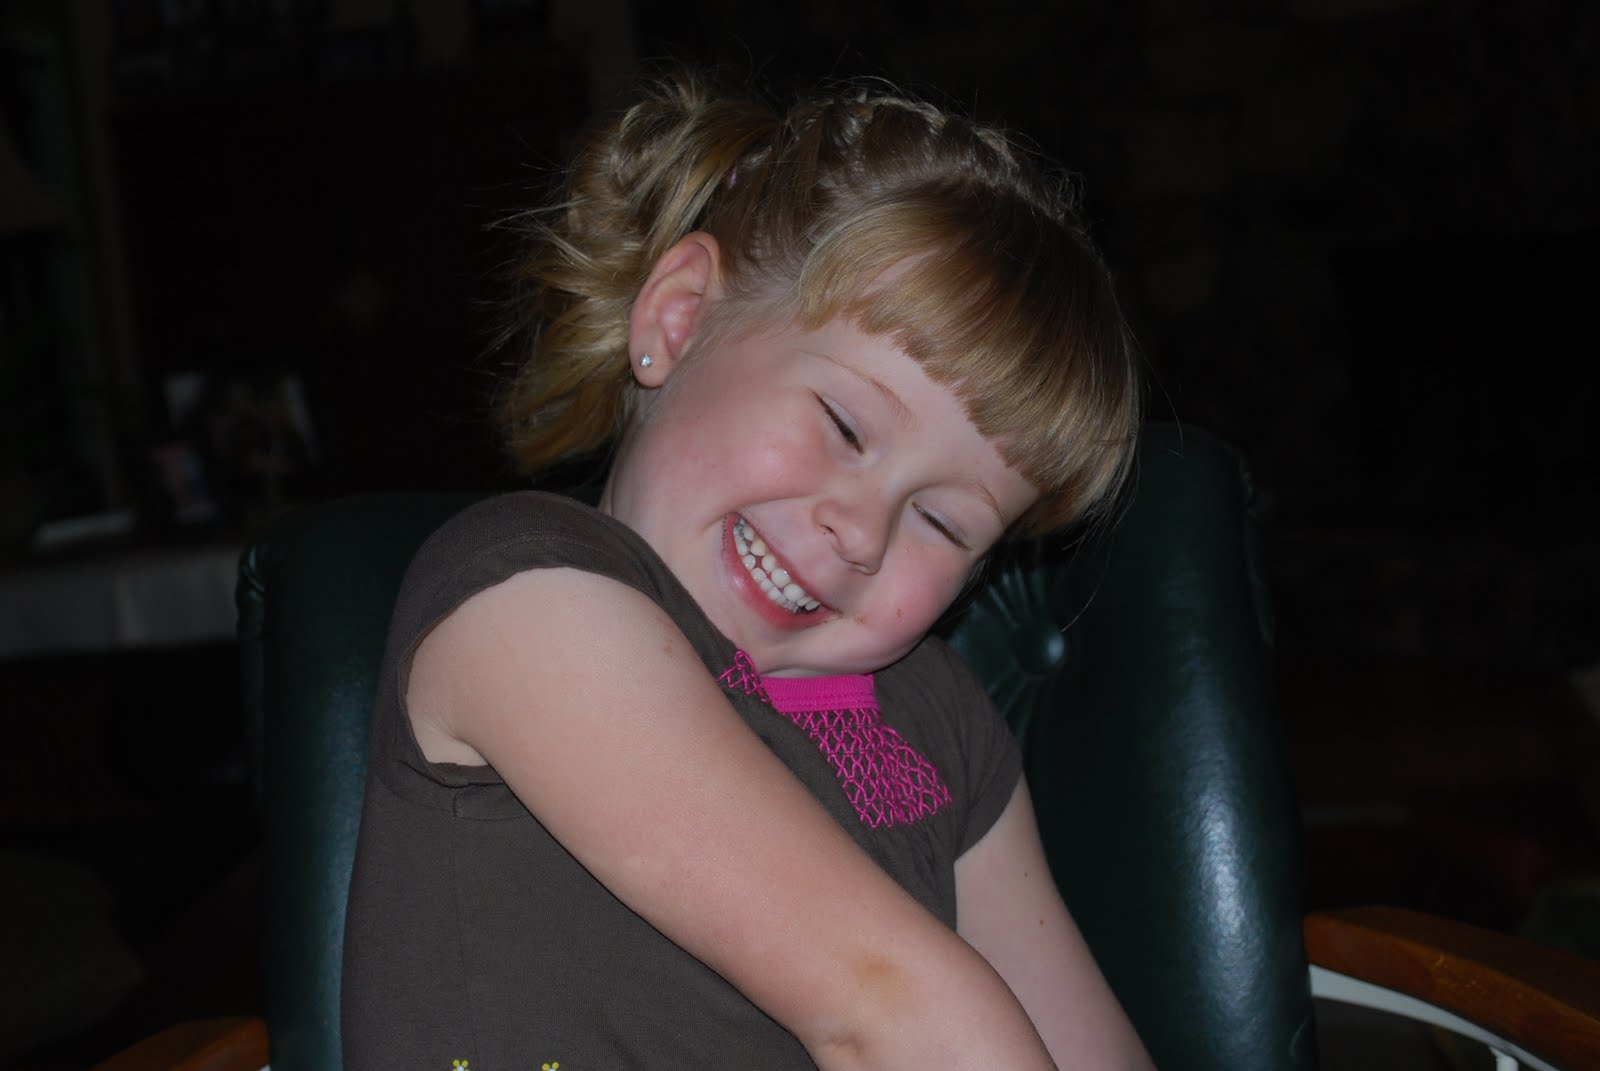 Simplify Birthday Buffet Bambinos amp Cobbler : Erika023 from cakesbykristin.blogspot.com size 1600 x 1071 jpeg 86kB